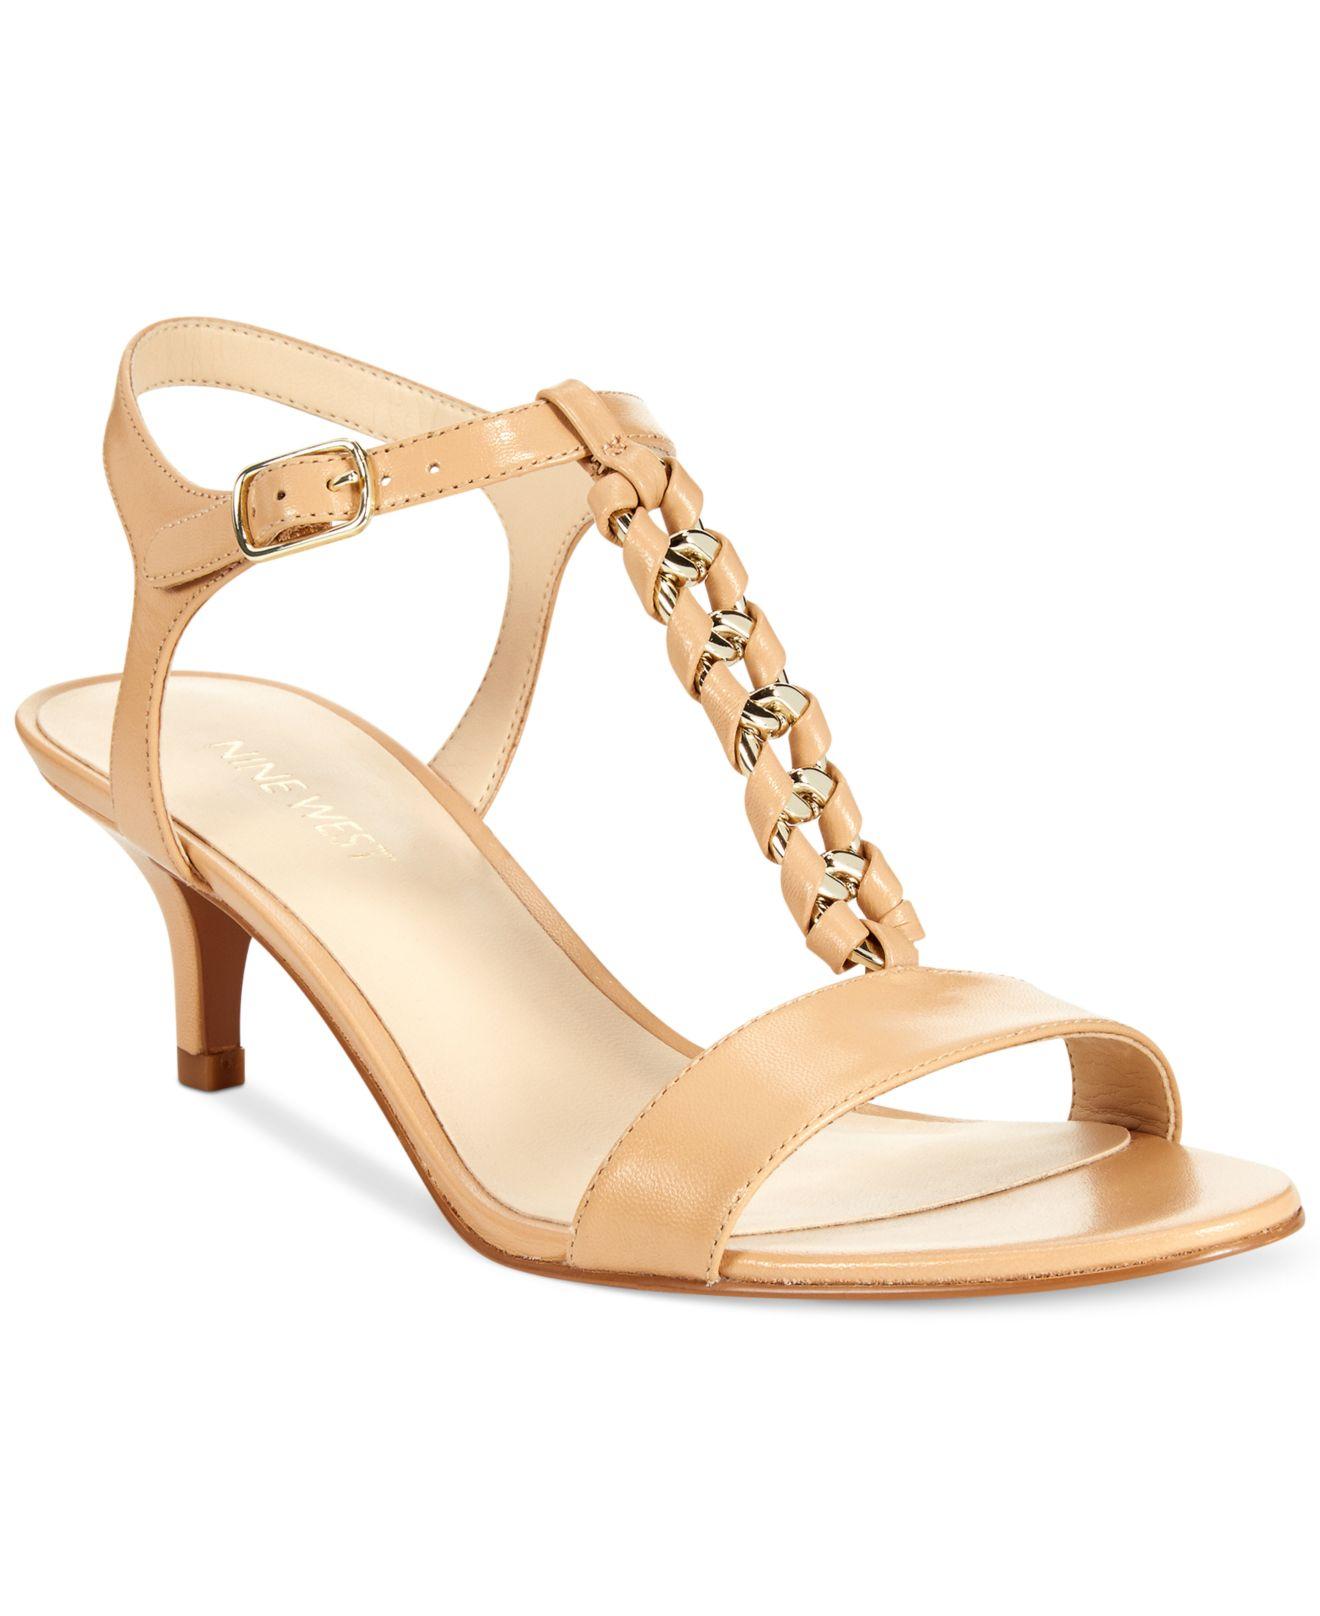 Simple Women39s Shoes Blossom Crystal 1 Embellished Low Heel Dress Sandals